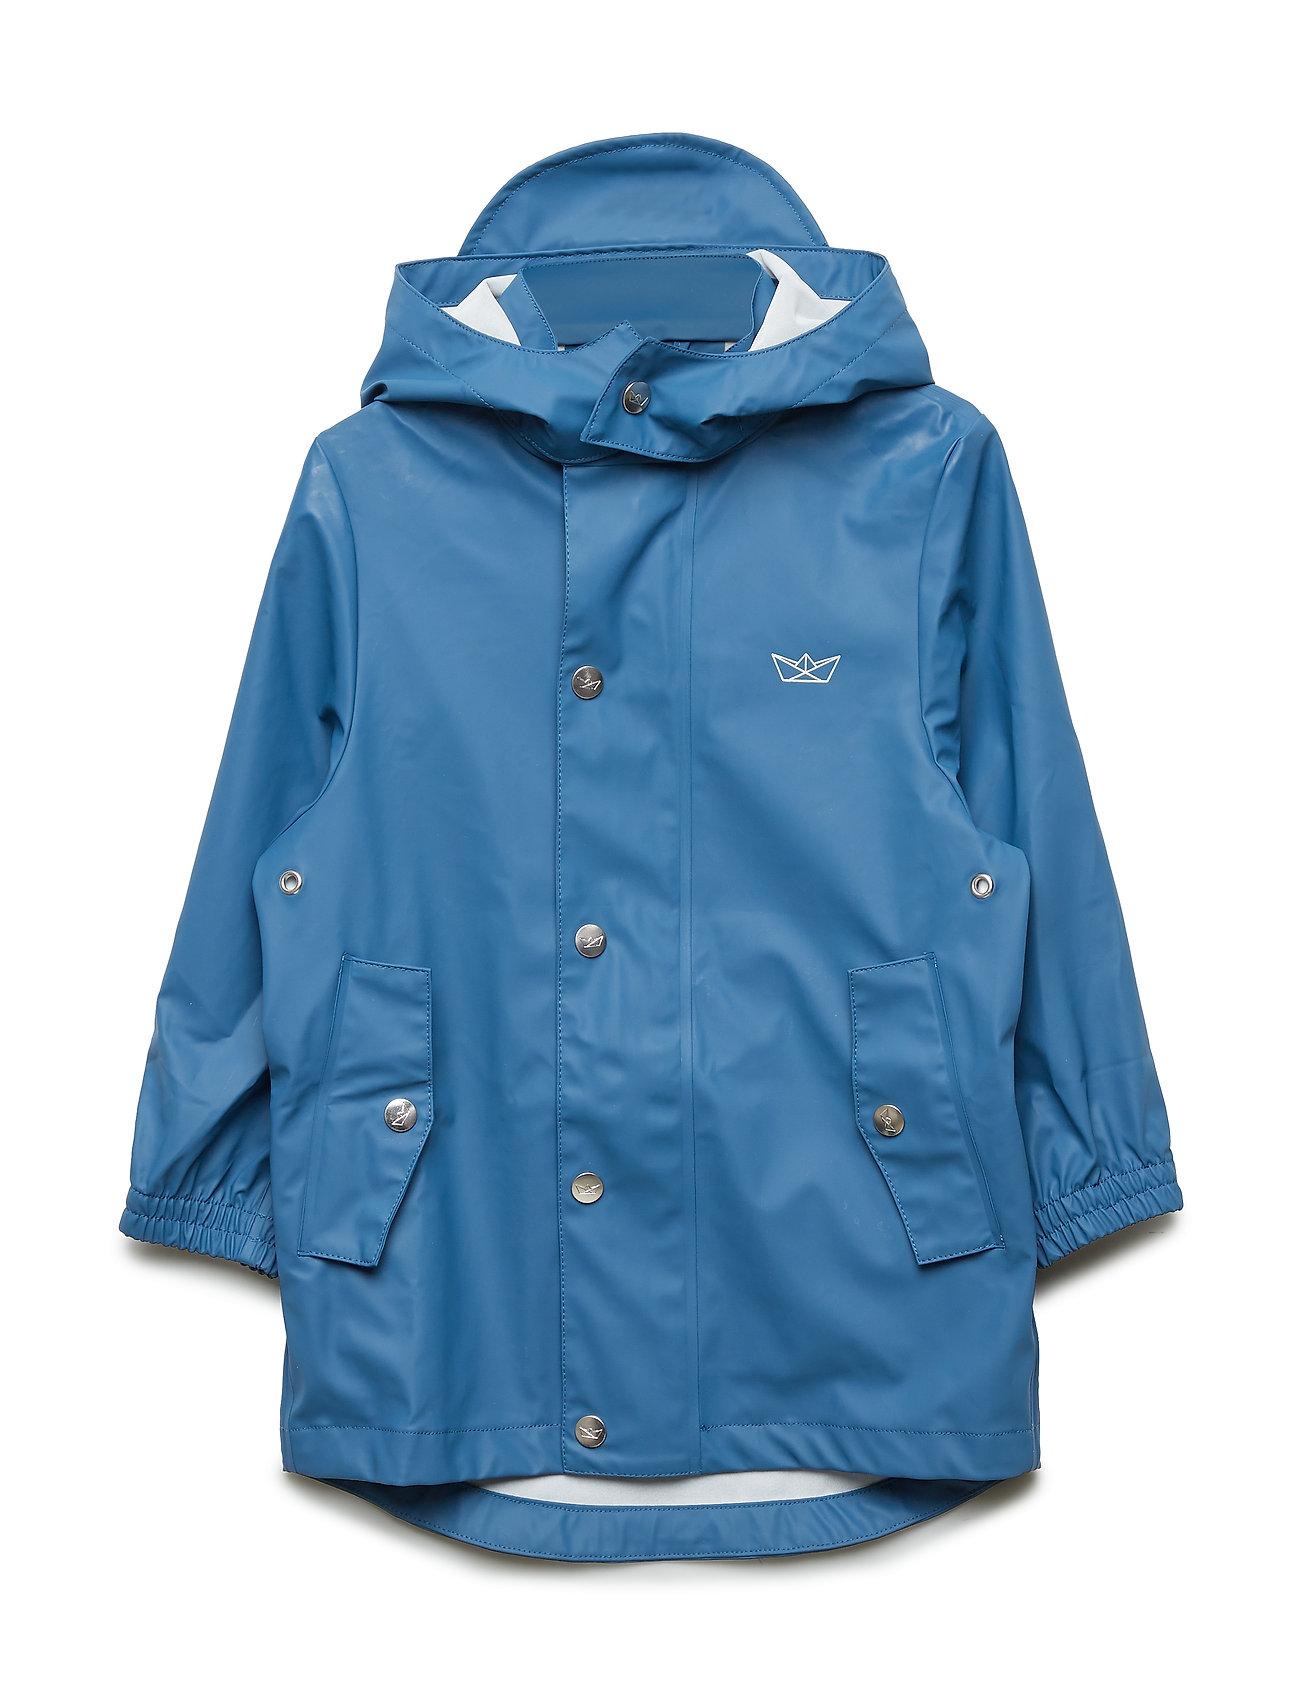 SWAYS Coast Jacket